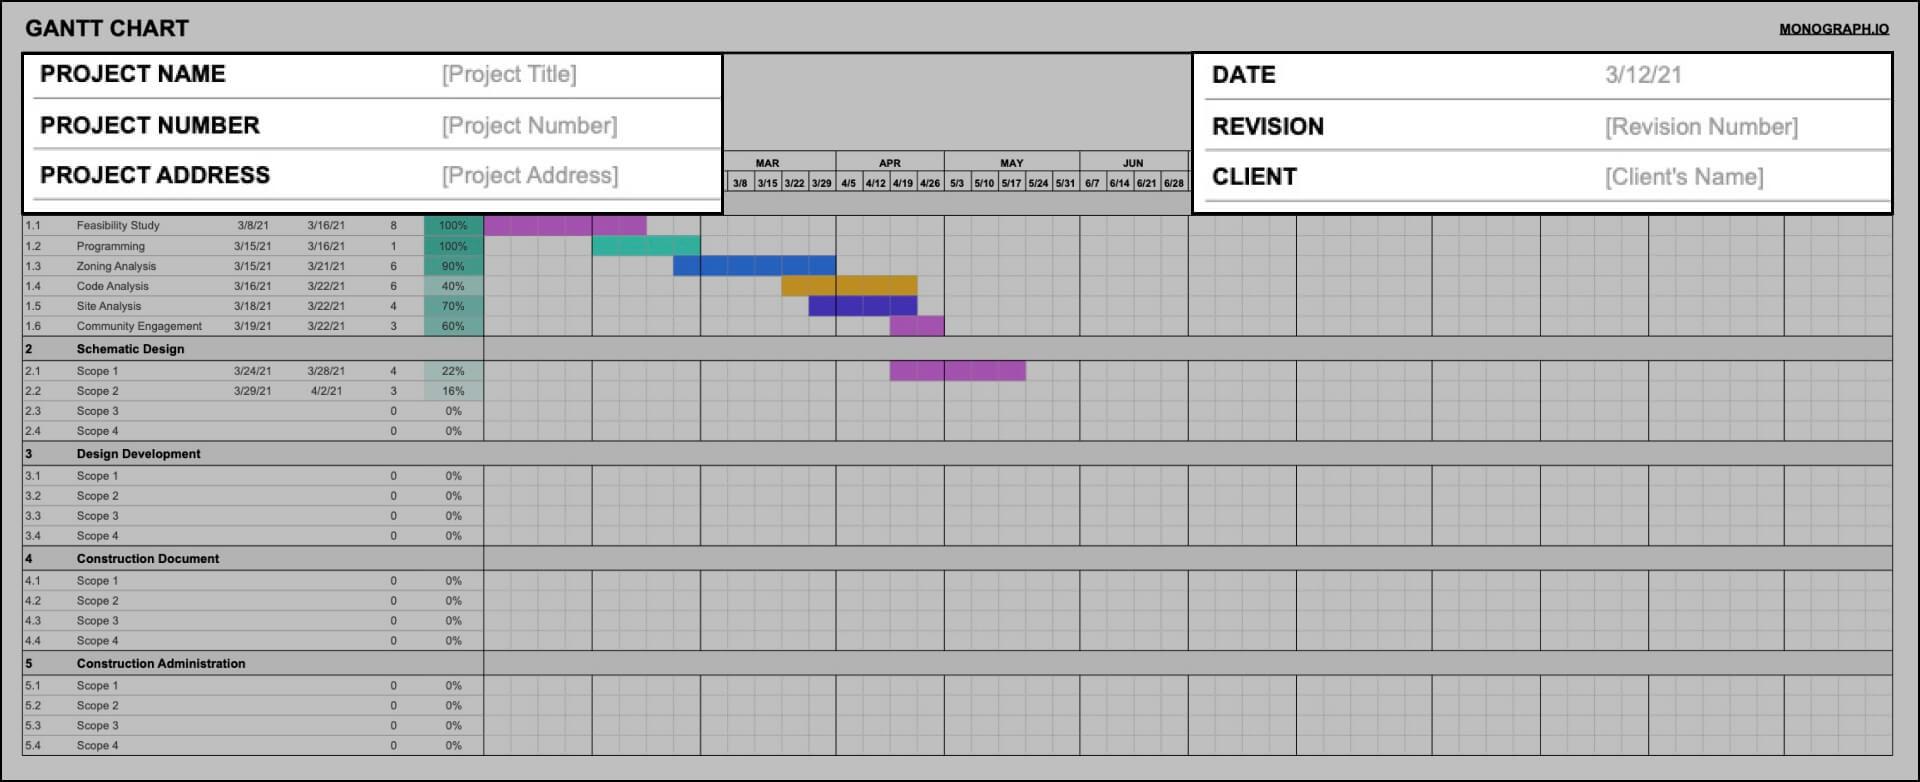 Gantt Chart Project Information